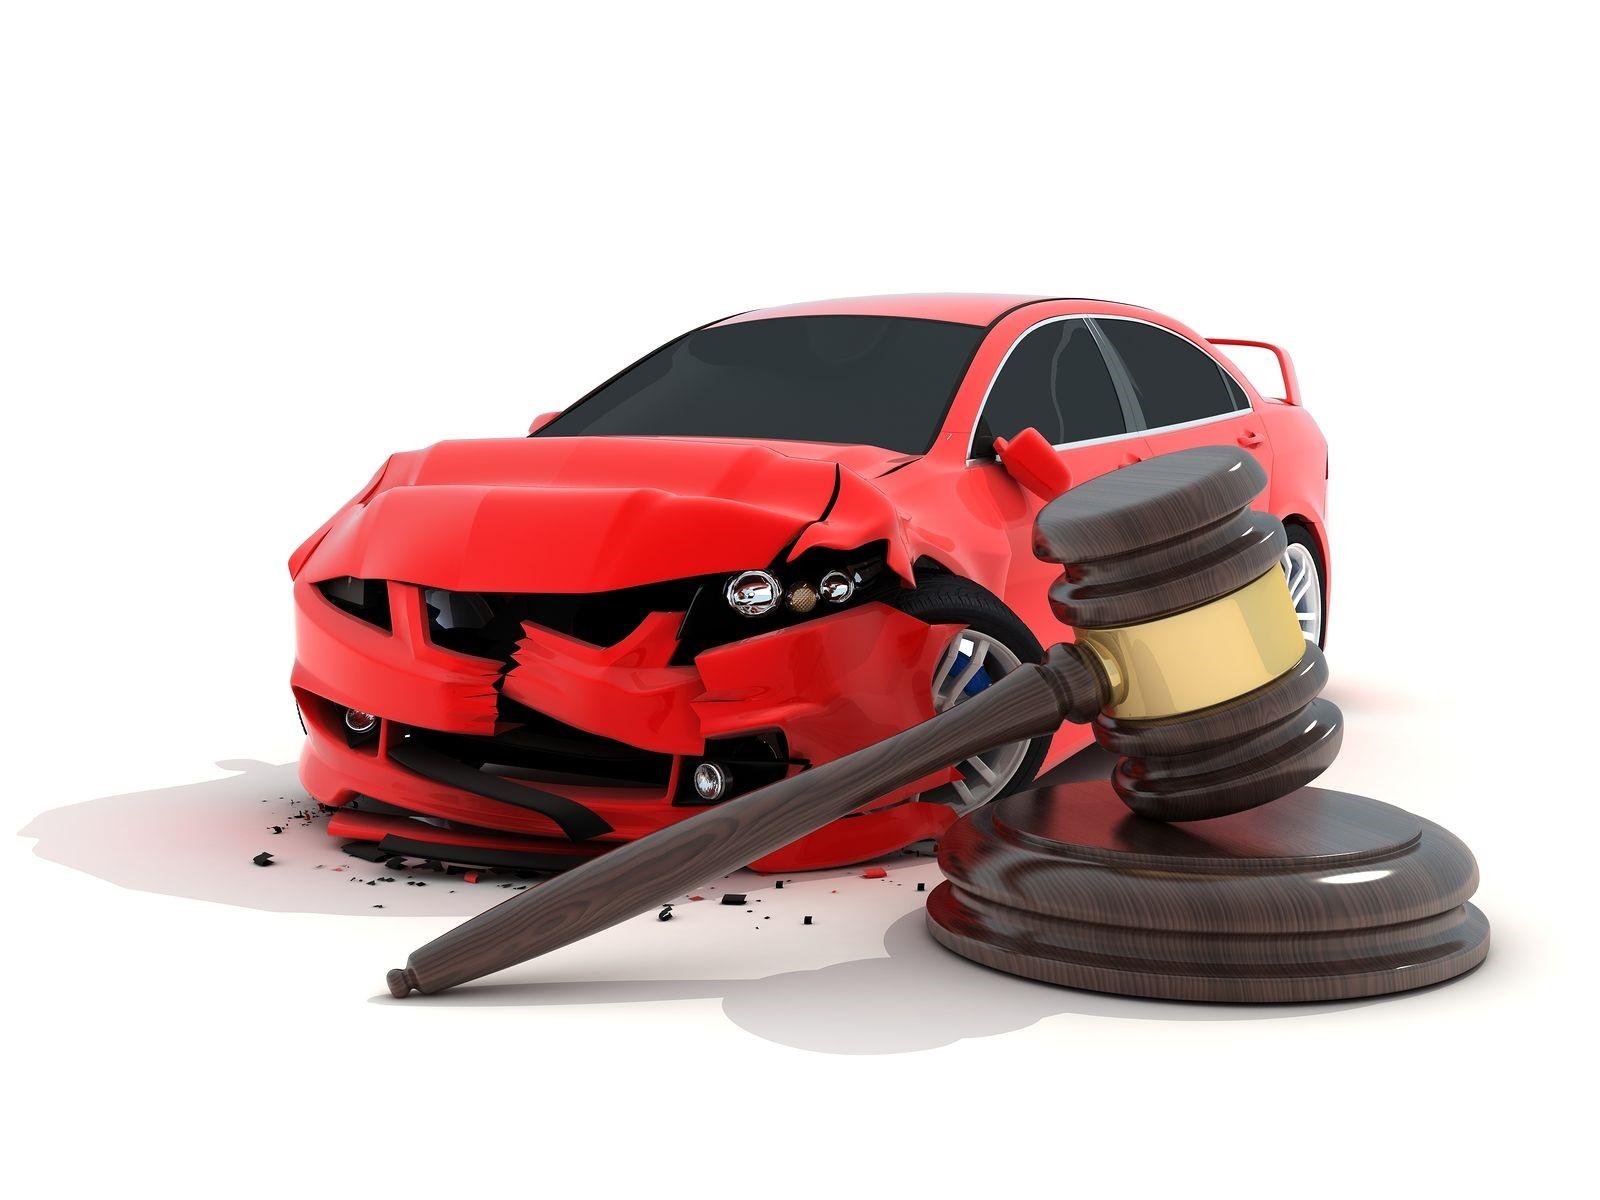 Got A Lemon Vehicle? Contact A Lemon Law Attorney For Some Assistance